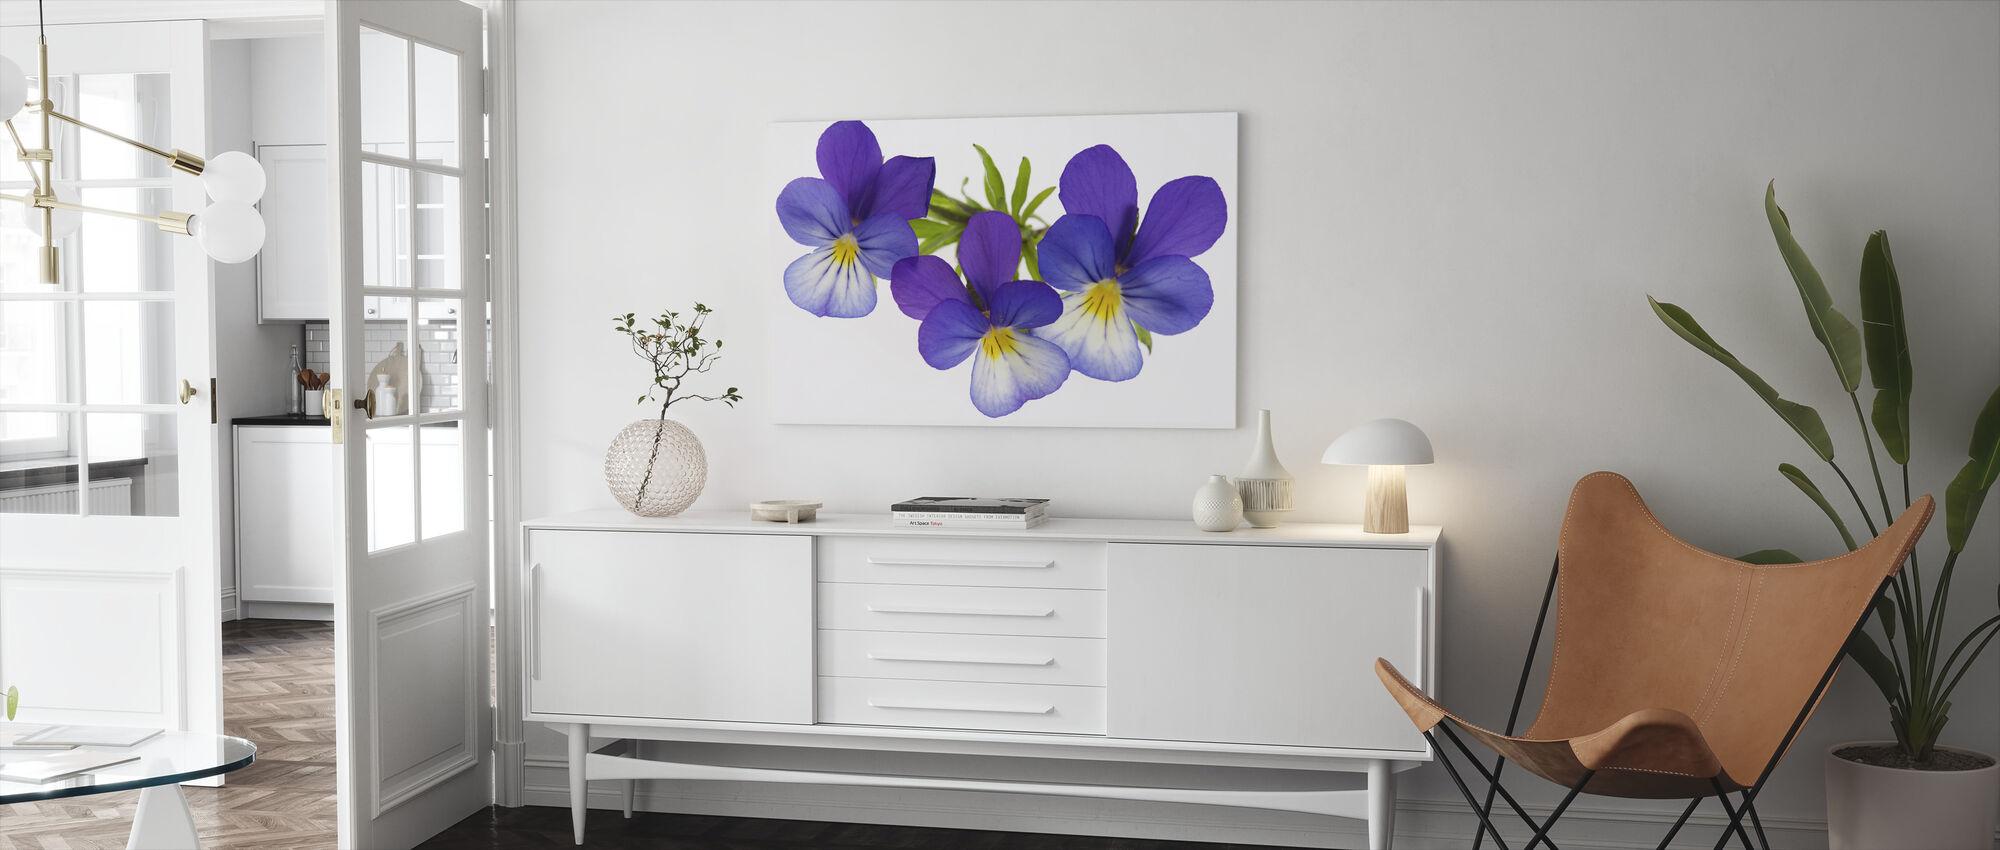 Purple Pansies - Canvas print - Living Room